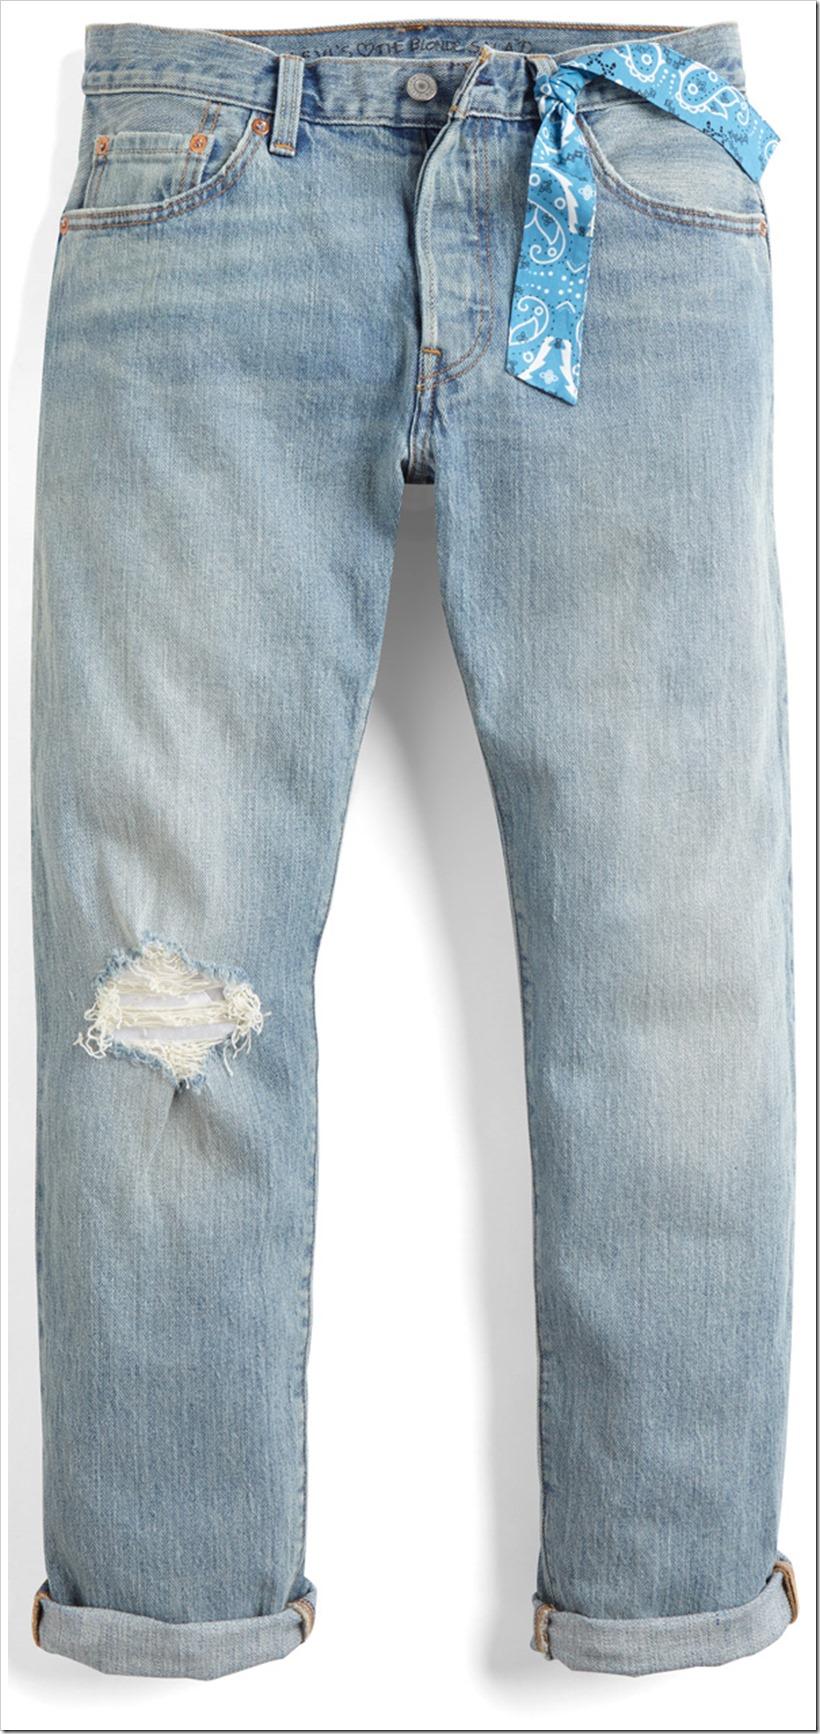 Chiara Ferragni Jeans By Levi's | Denimsandjeans